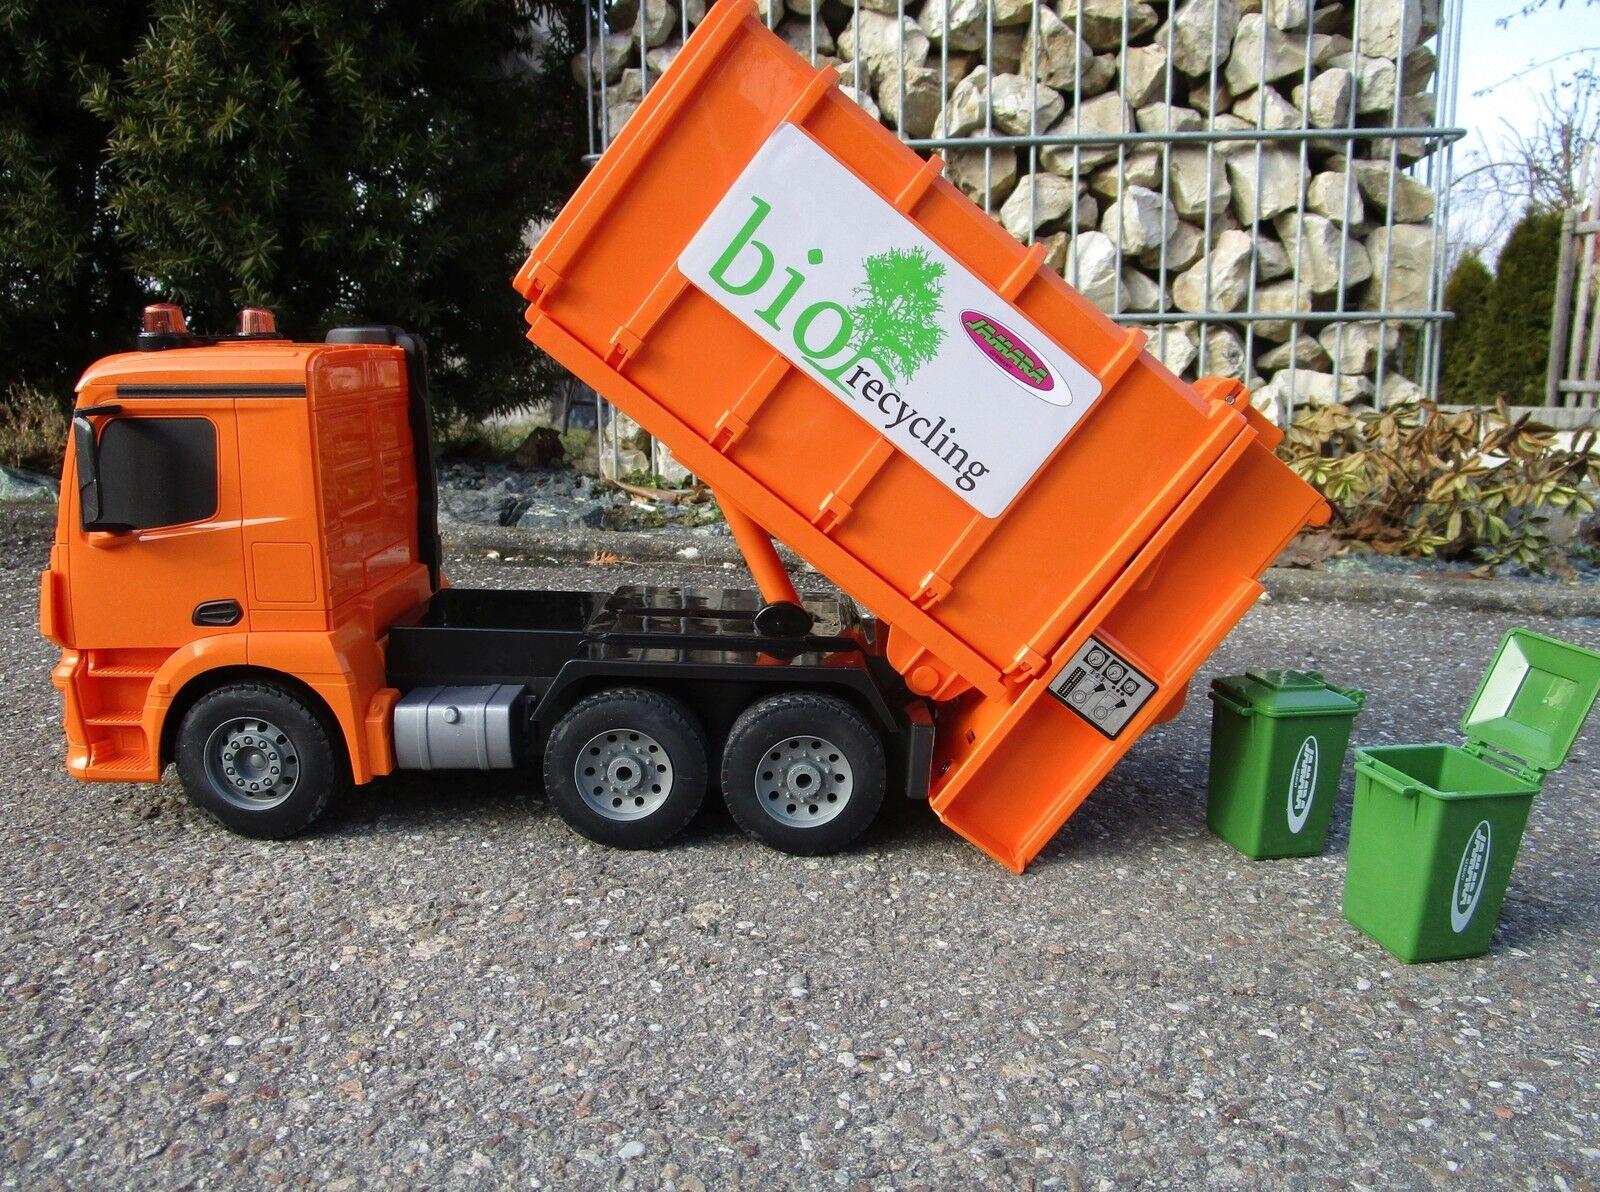 RC camion dei rifiuti MERCEDES 1 20 2,4ghz spazzatura da postazione remota Auto Qualità Top 405079